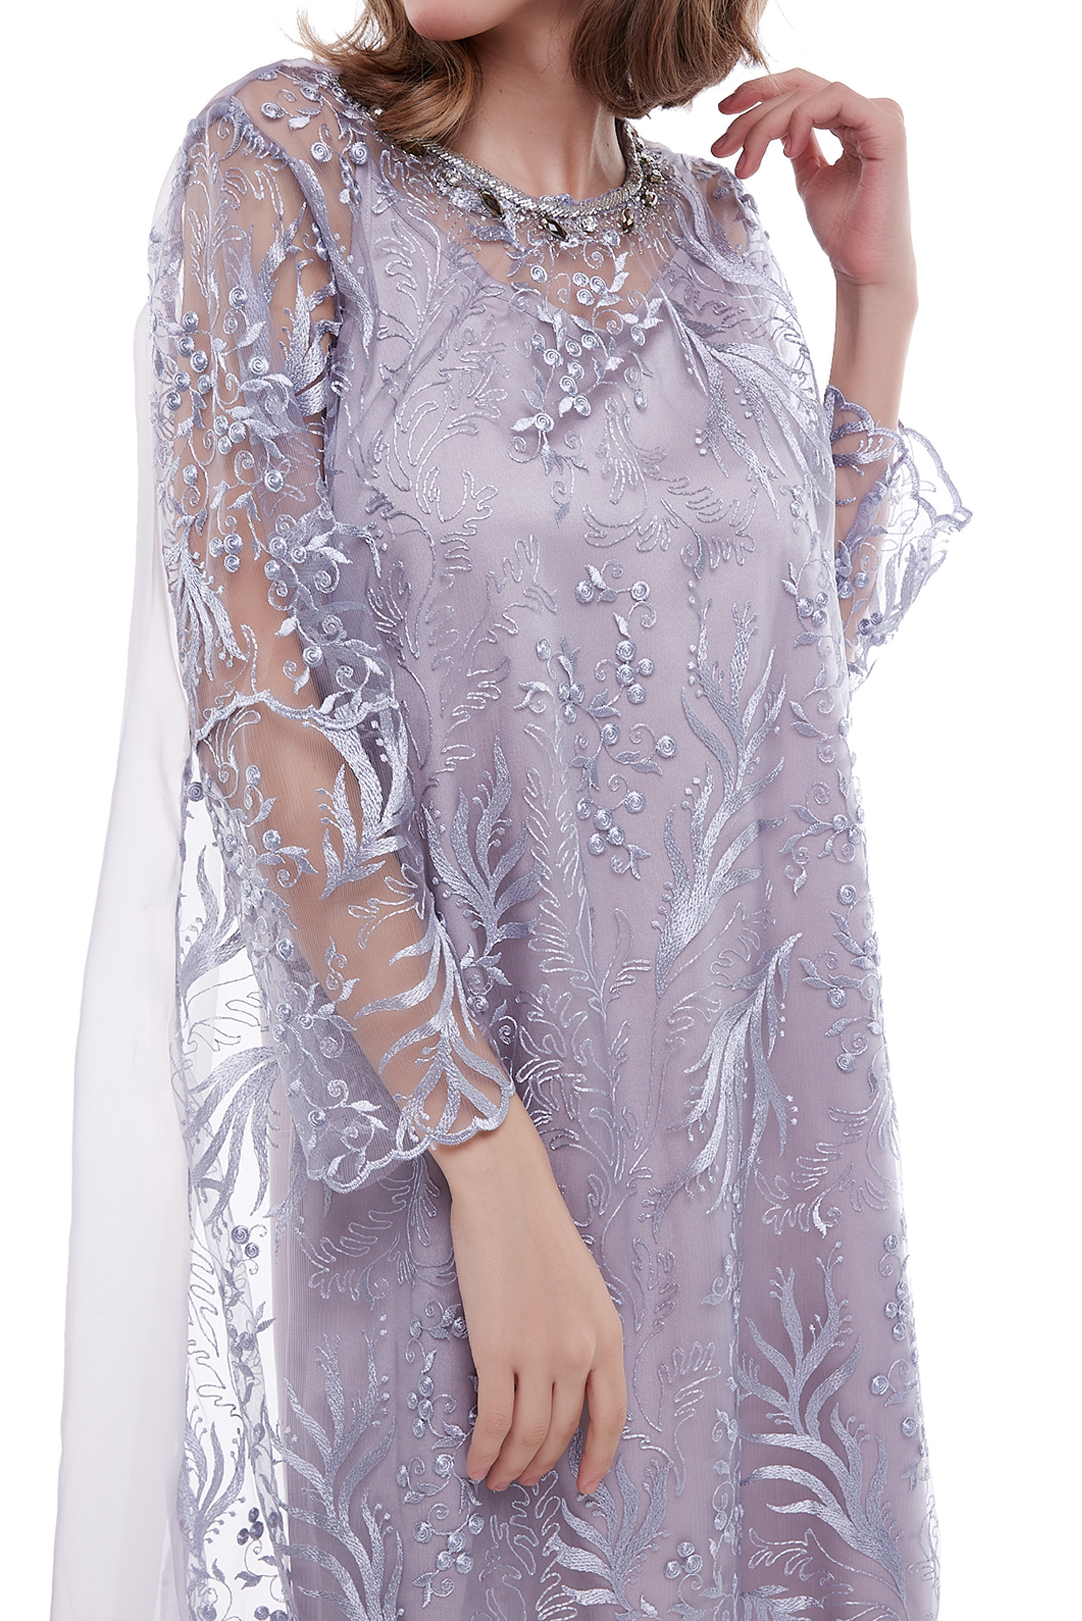 Gresya Dress